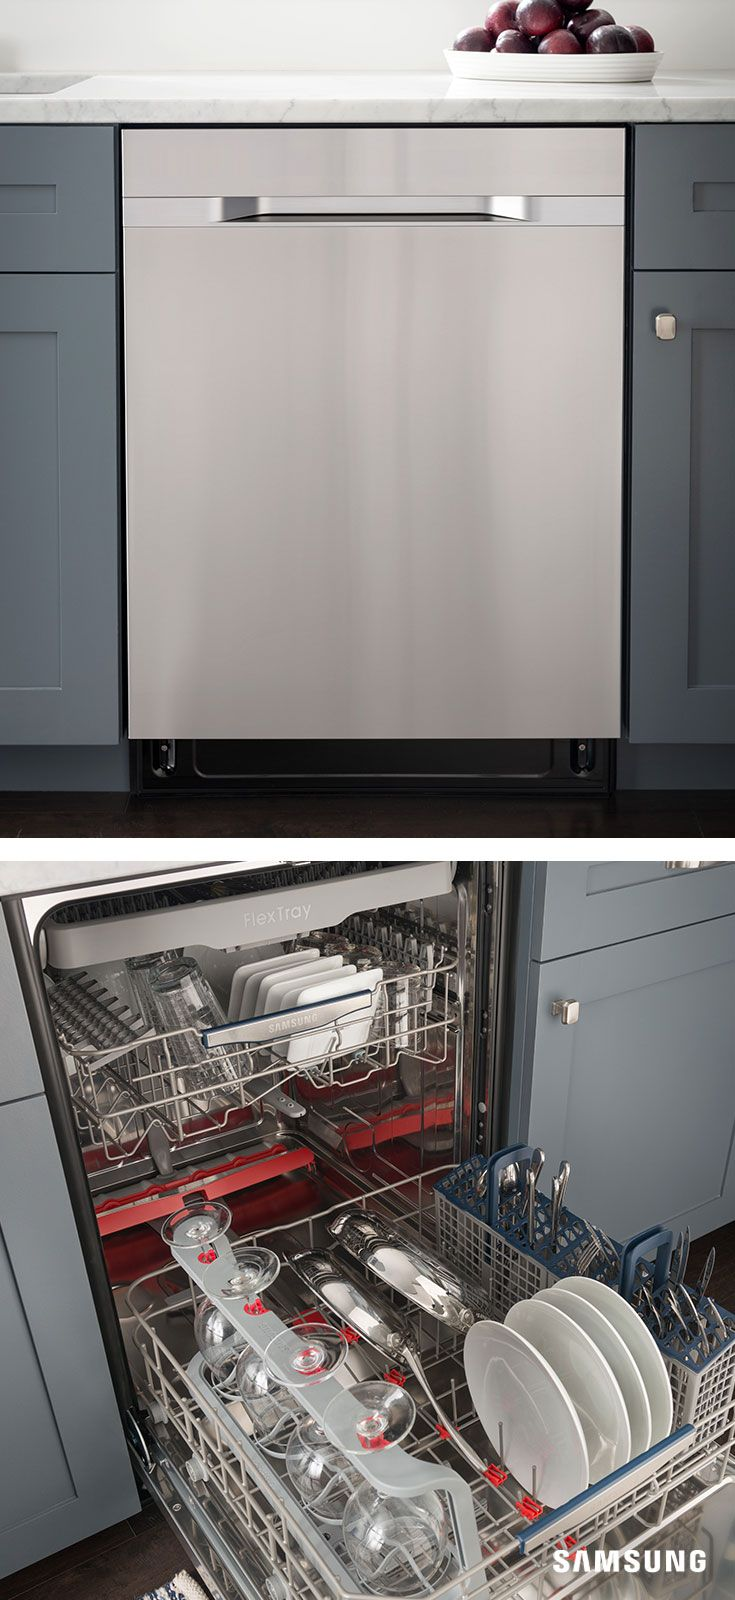 Miniature Dishwasher Viac Ako 25 Najlepaa Ch Napadov Na Pintereste Na Tacmu Dishwasher